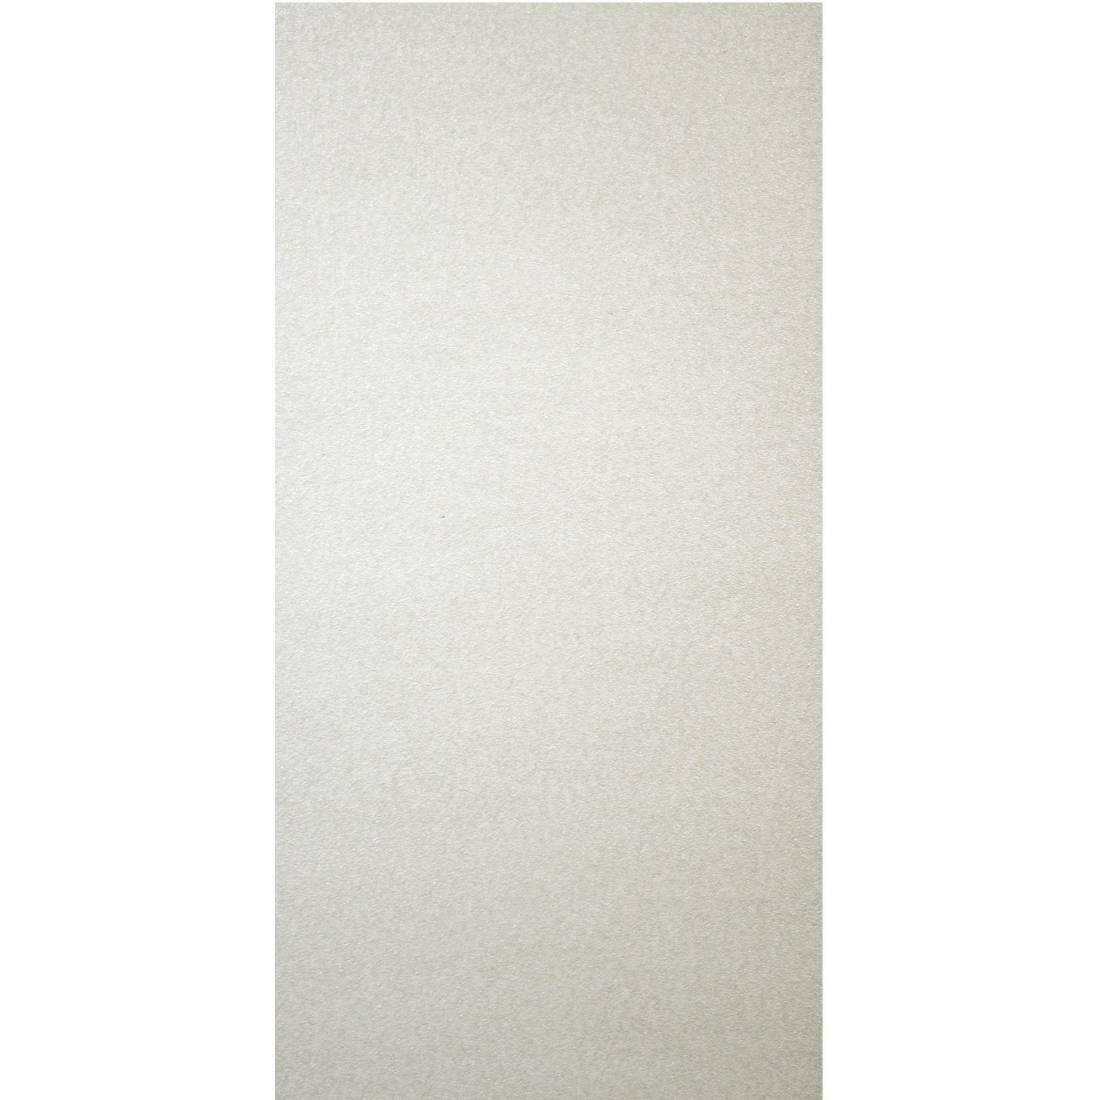 Borsalino 30x60 White Matt 1